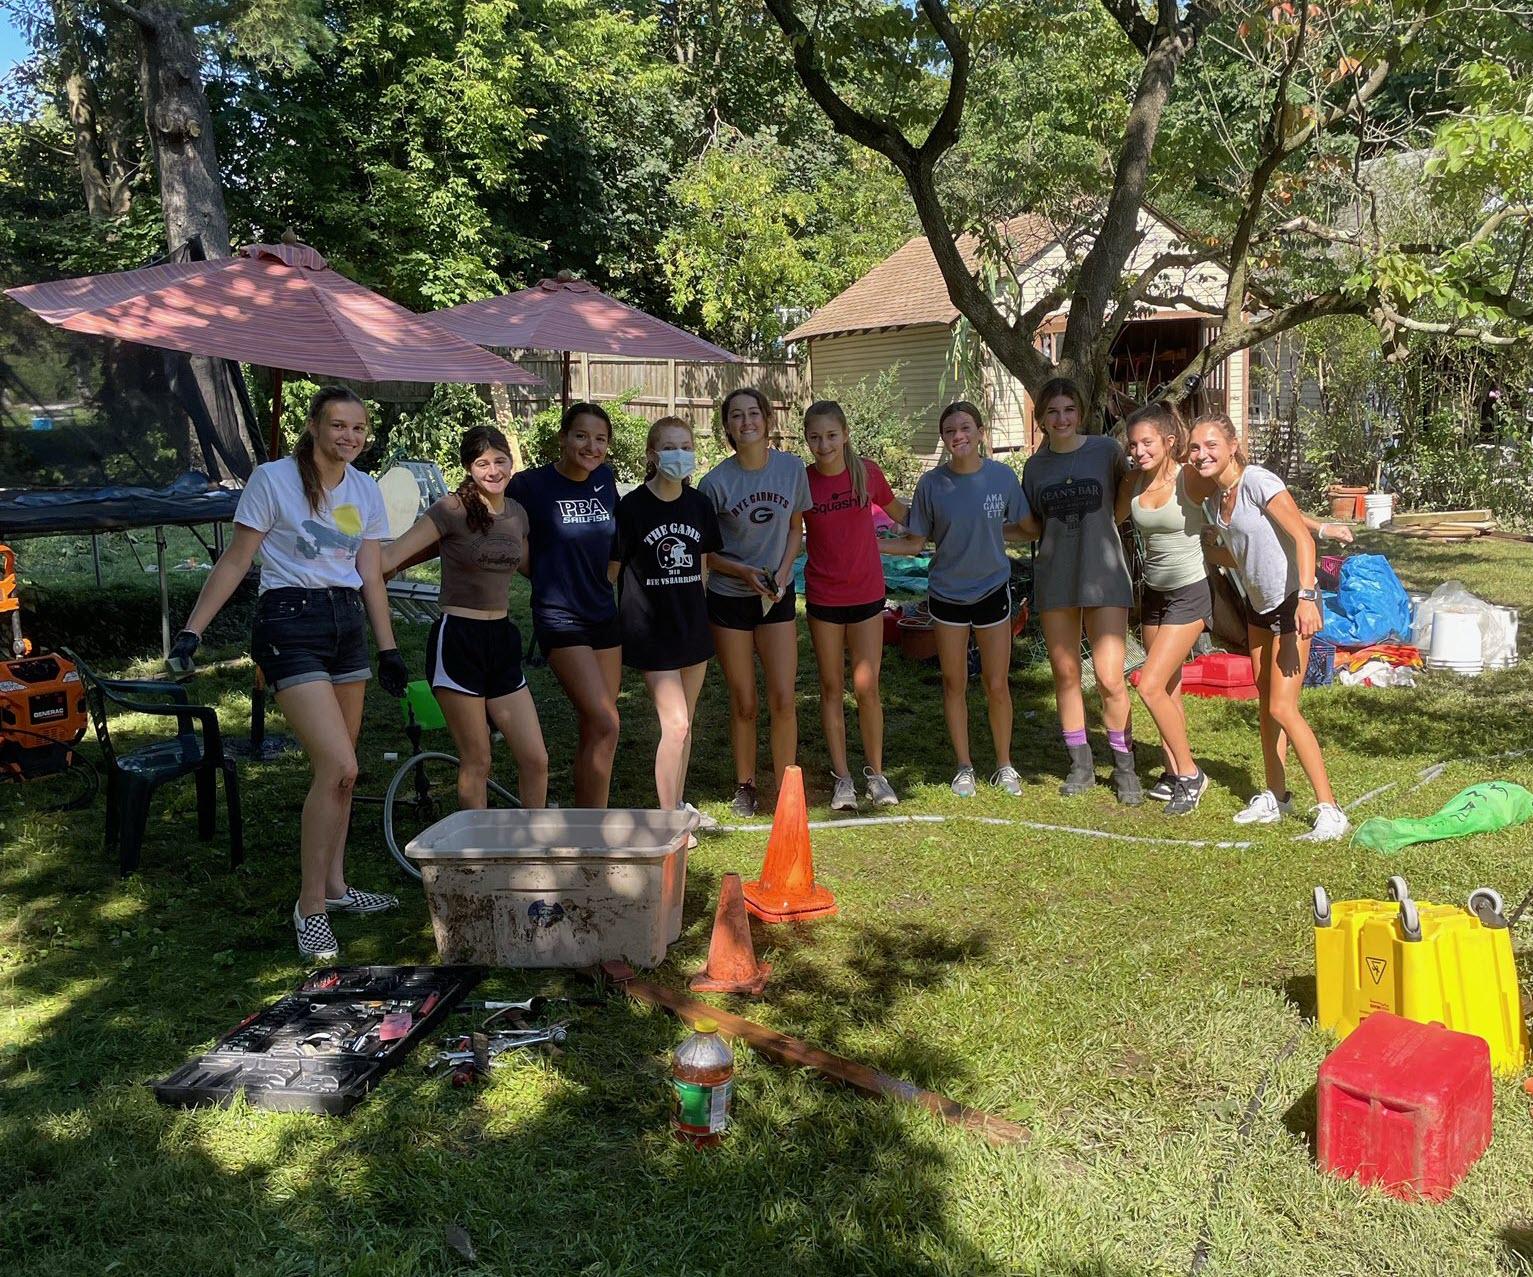 Junior Trio Leads Girls Volleyball - Pre-K to 12th Grade